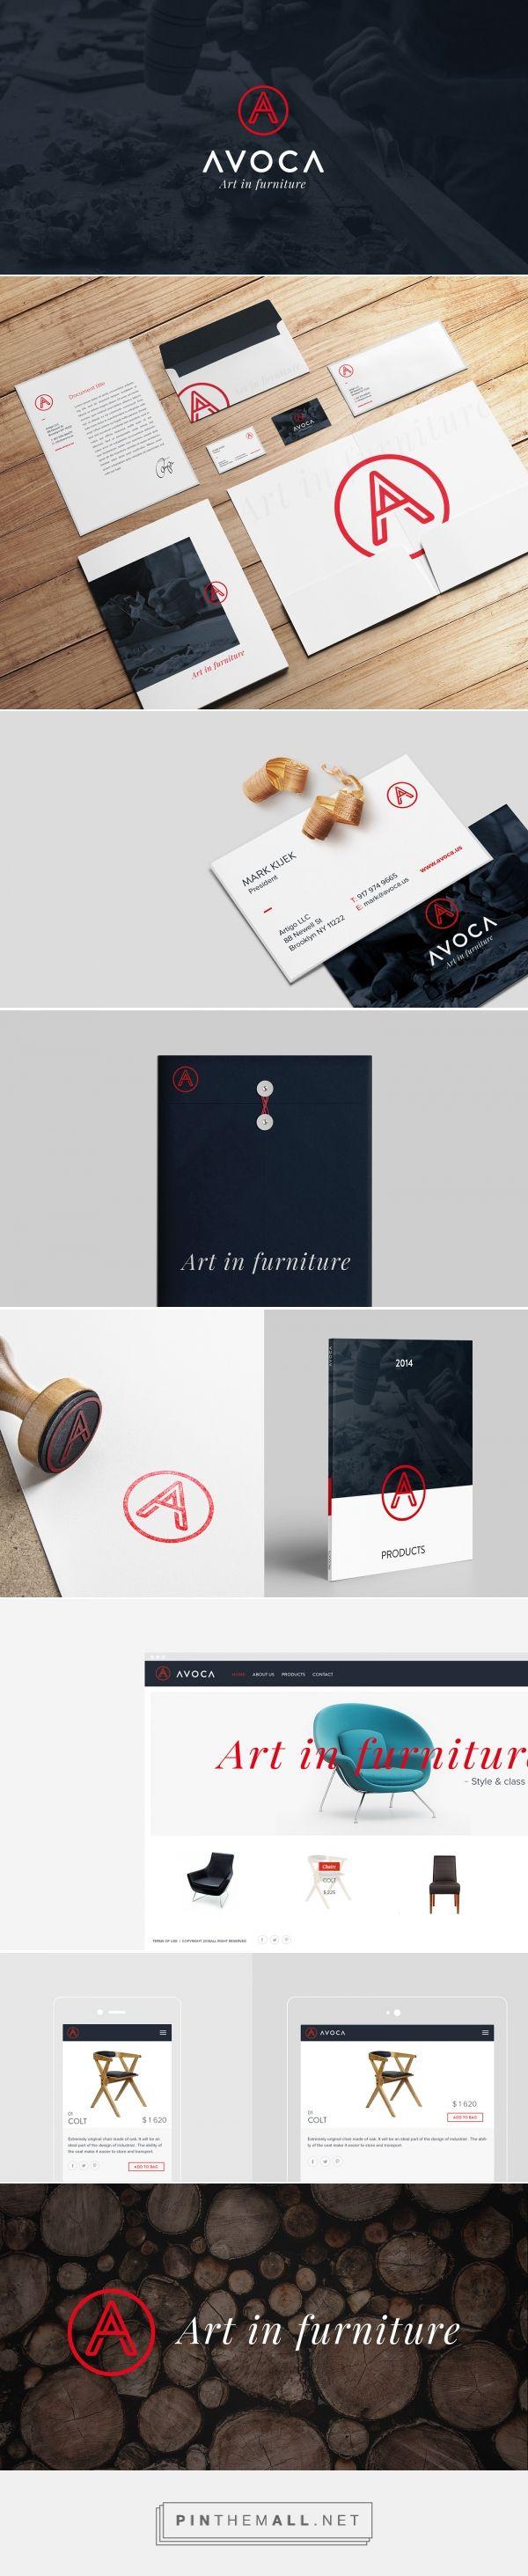 AVOCA Branding by NOMONO on Behance | Fivestar Branding – Design and Branding Agency & Inspiration Gallery